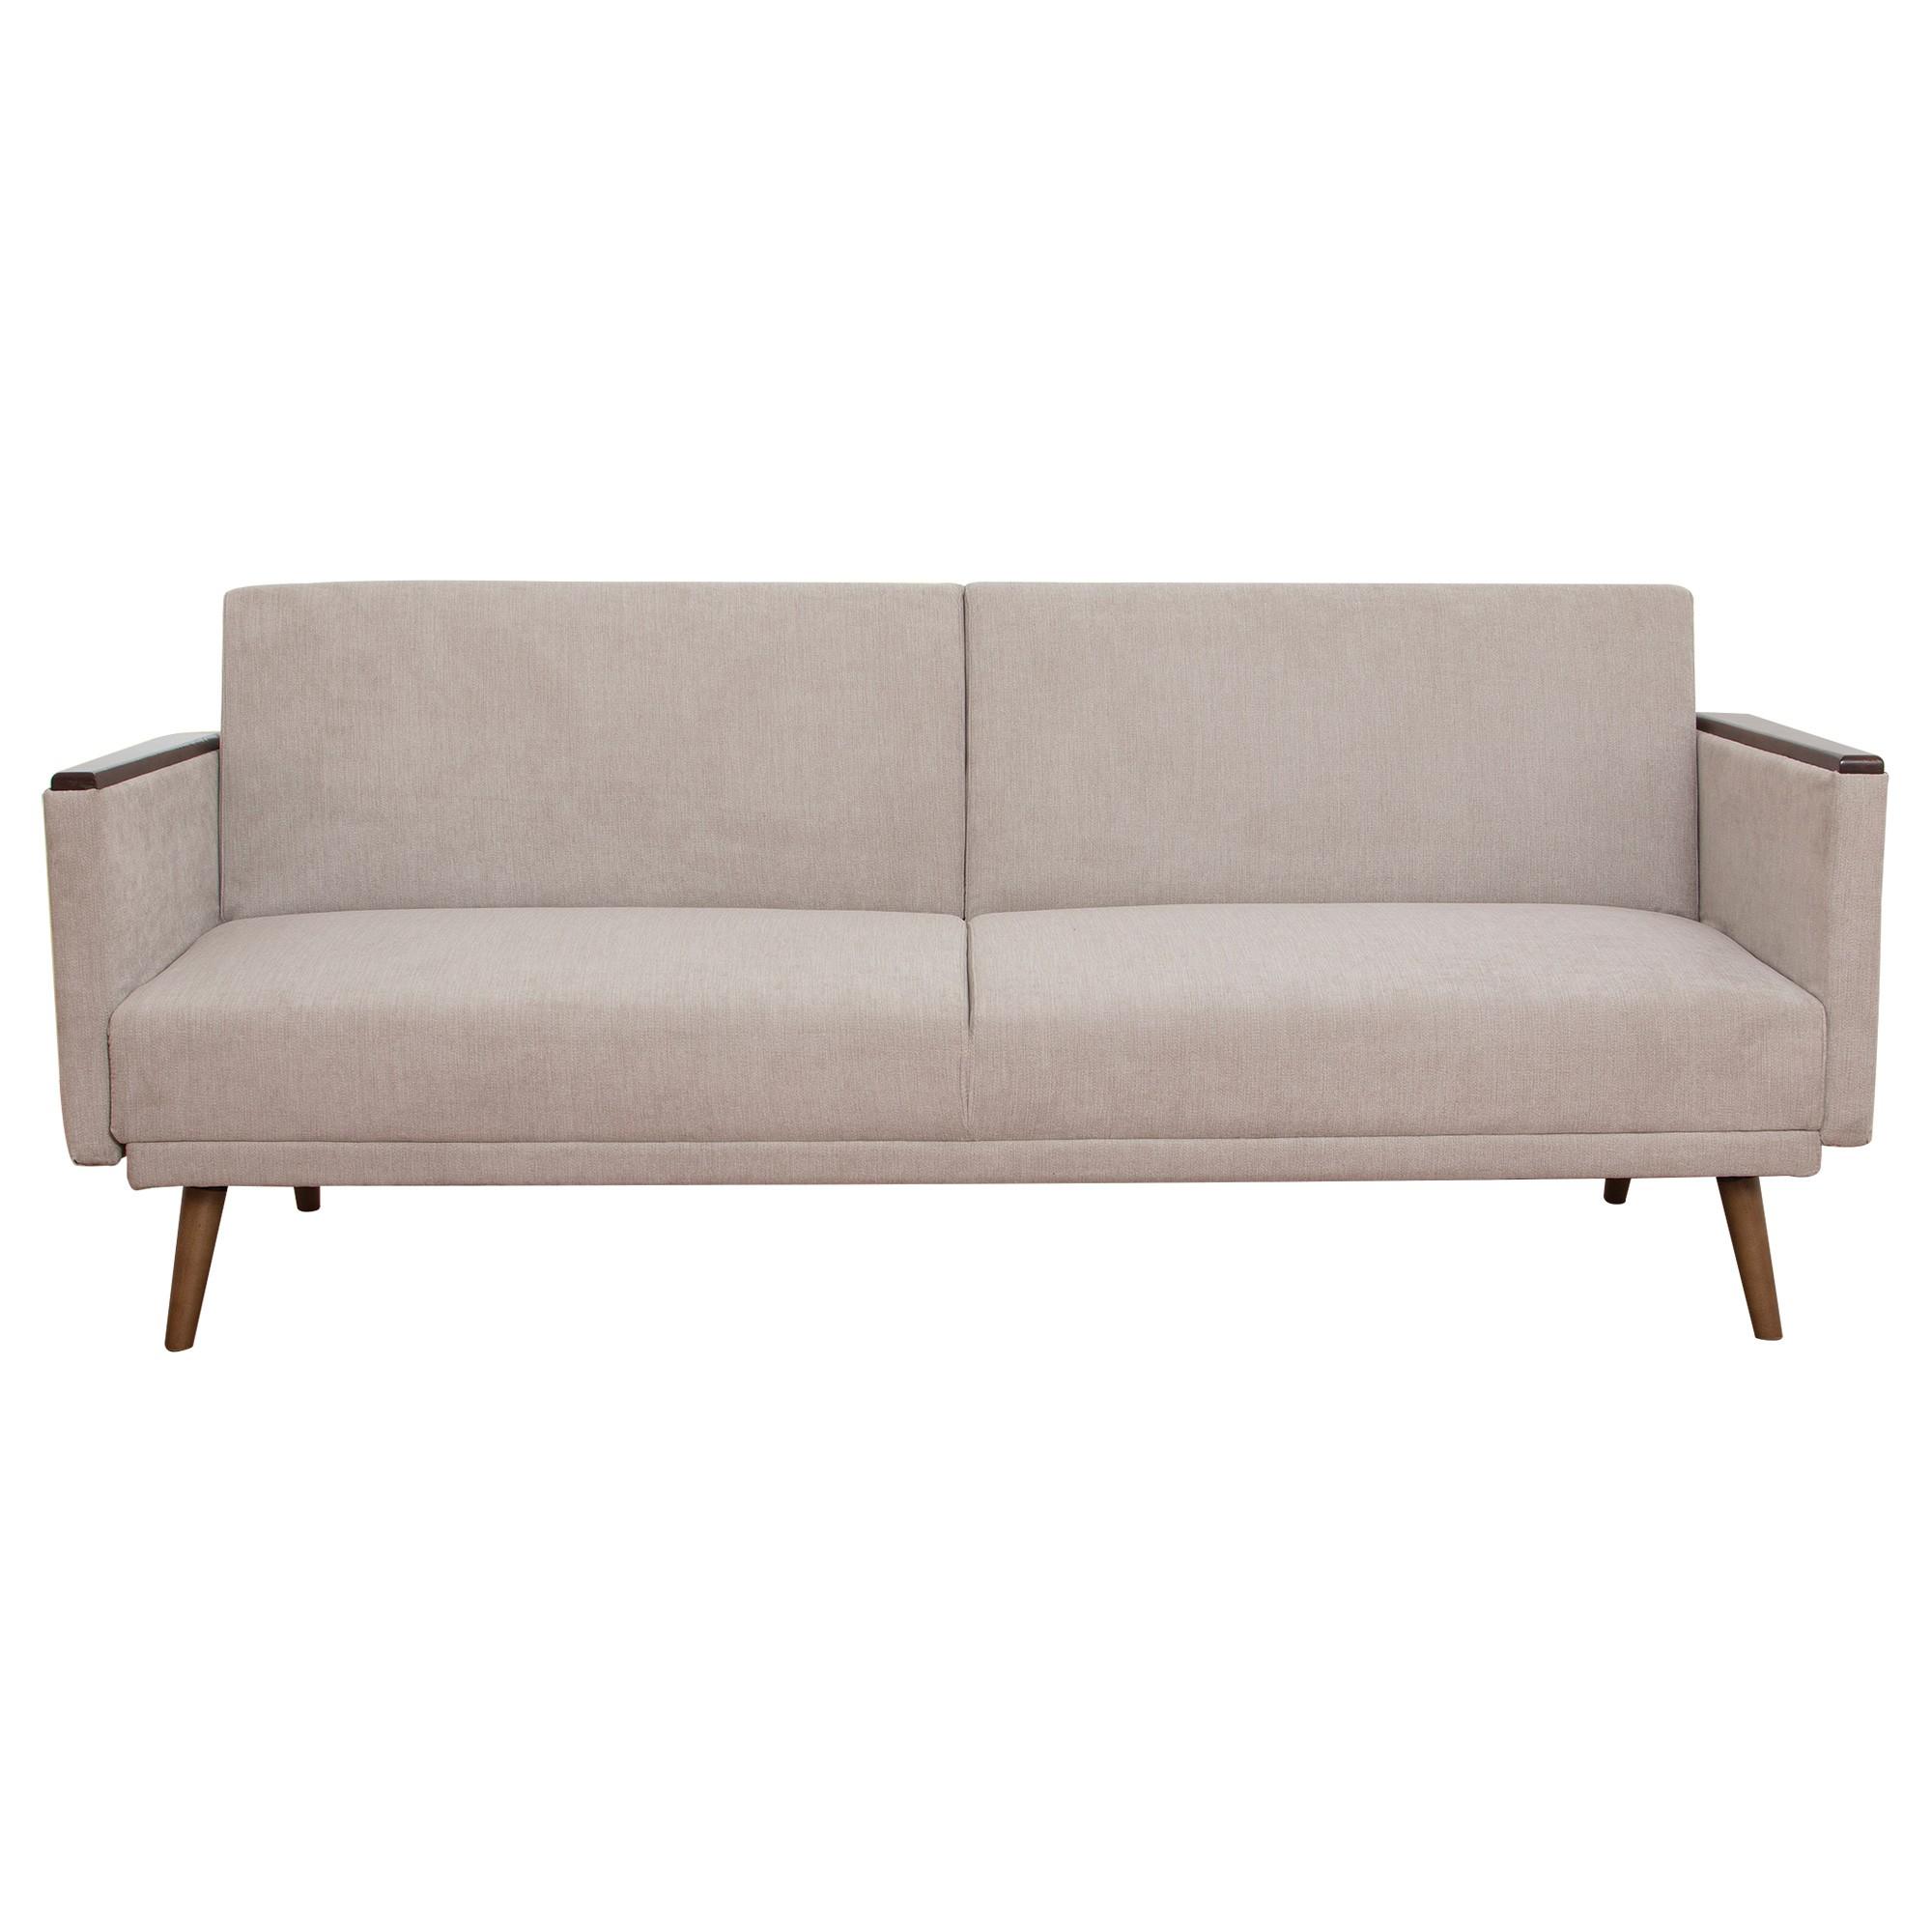 Jasper Ezy Action Fabric Futon Sofa Bed, Latte